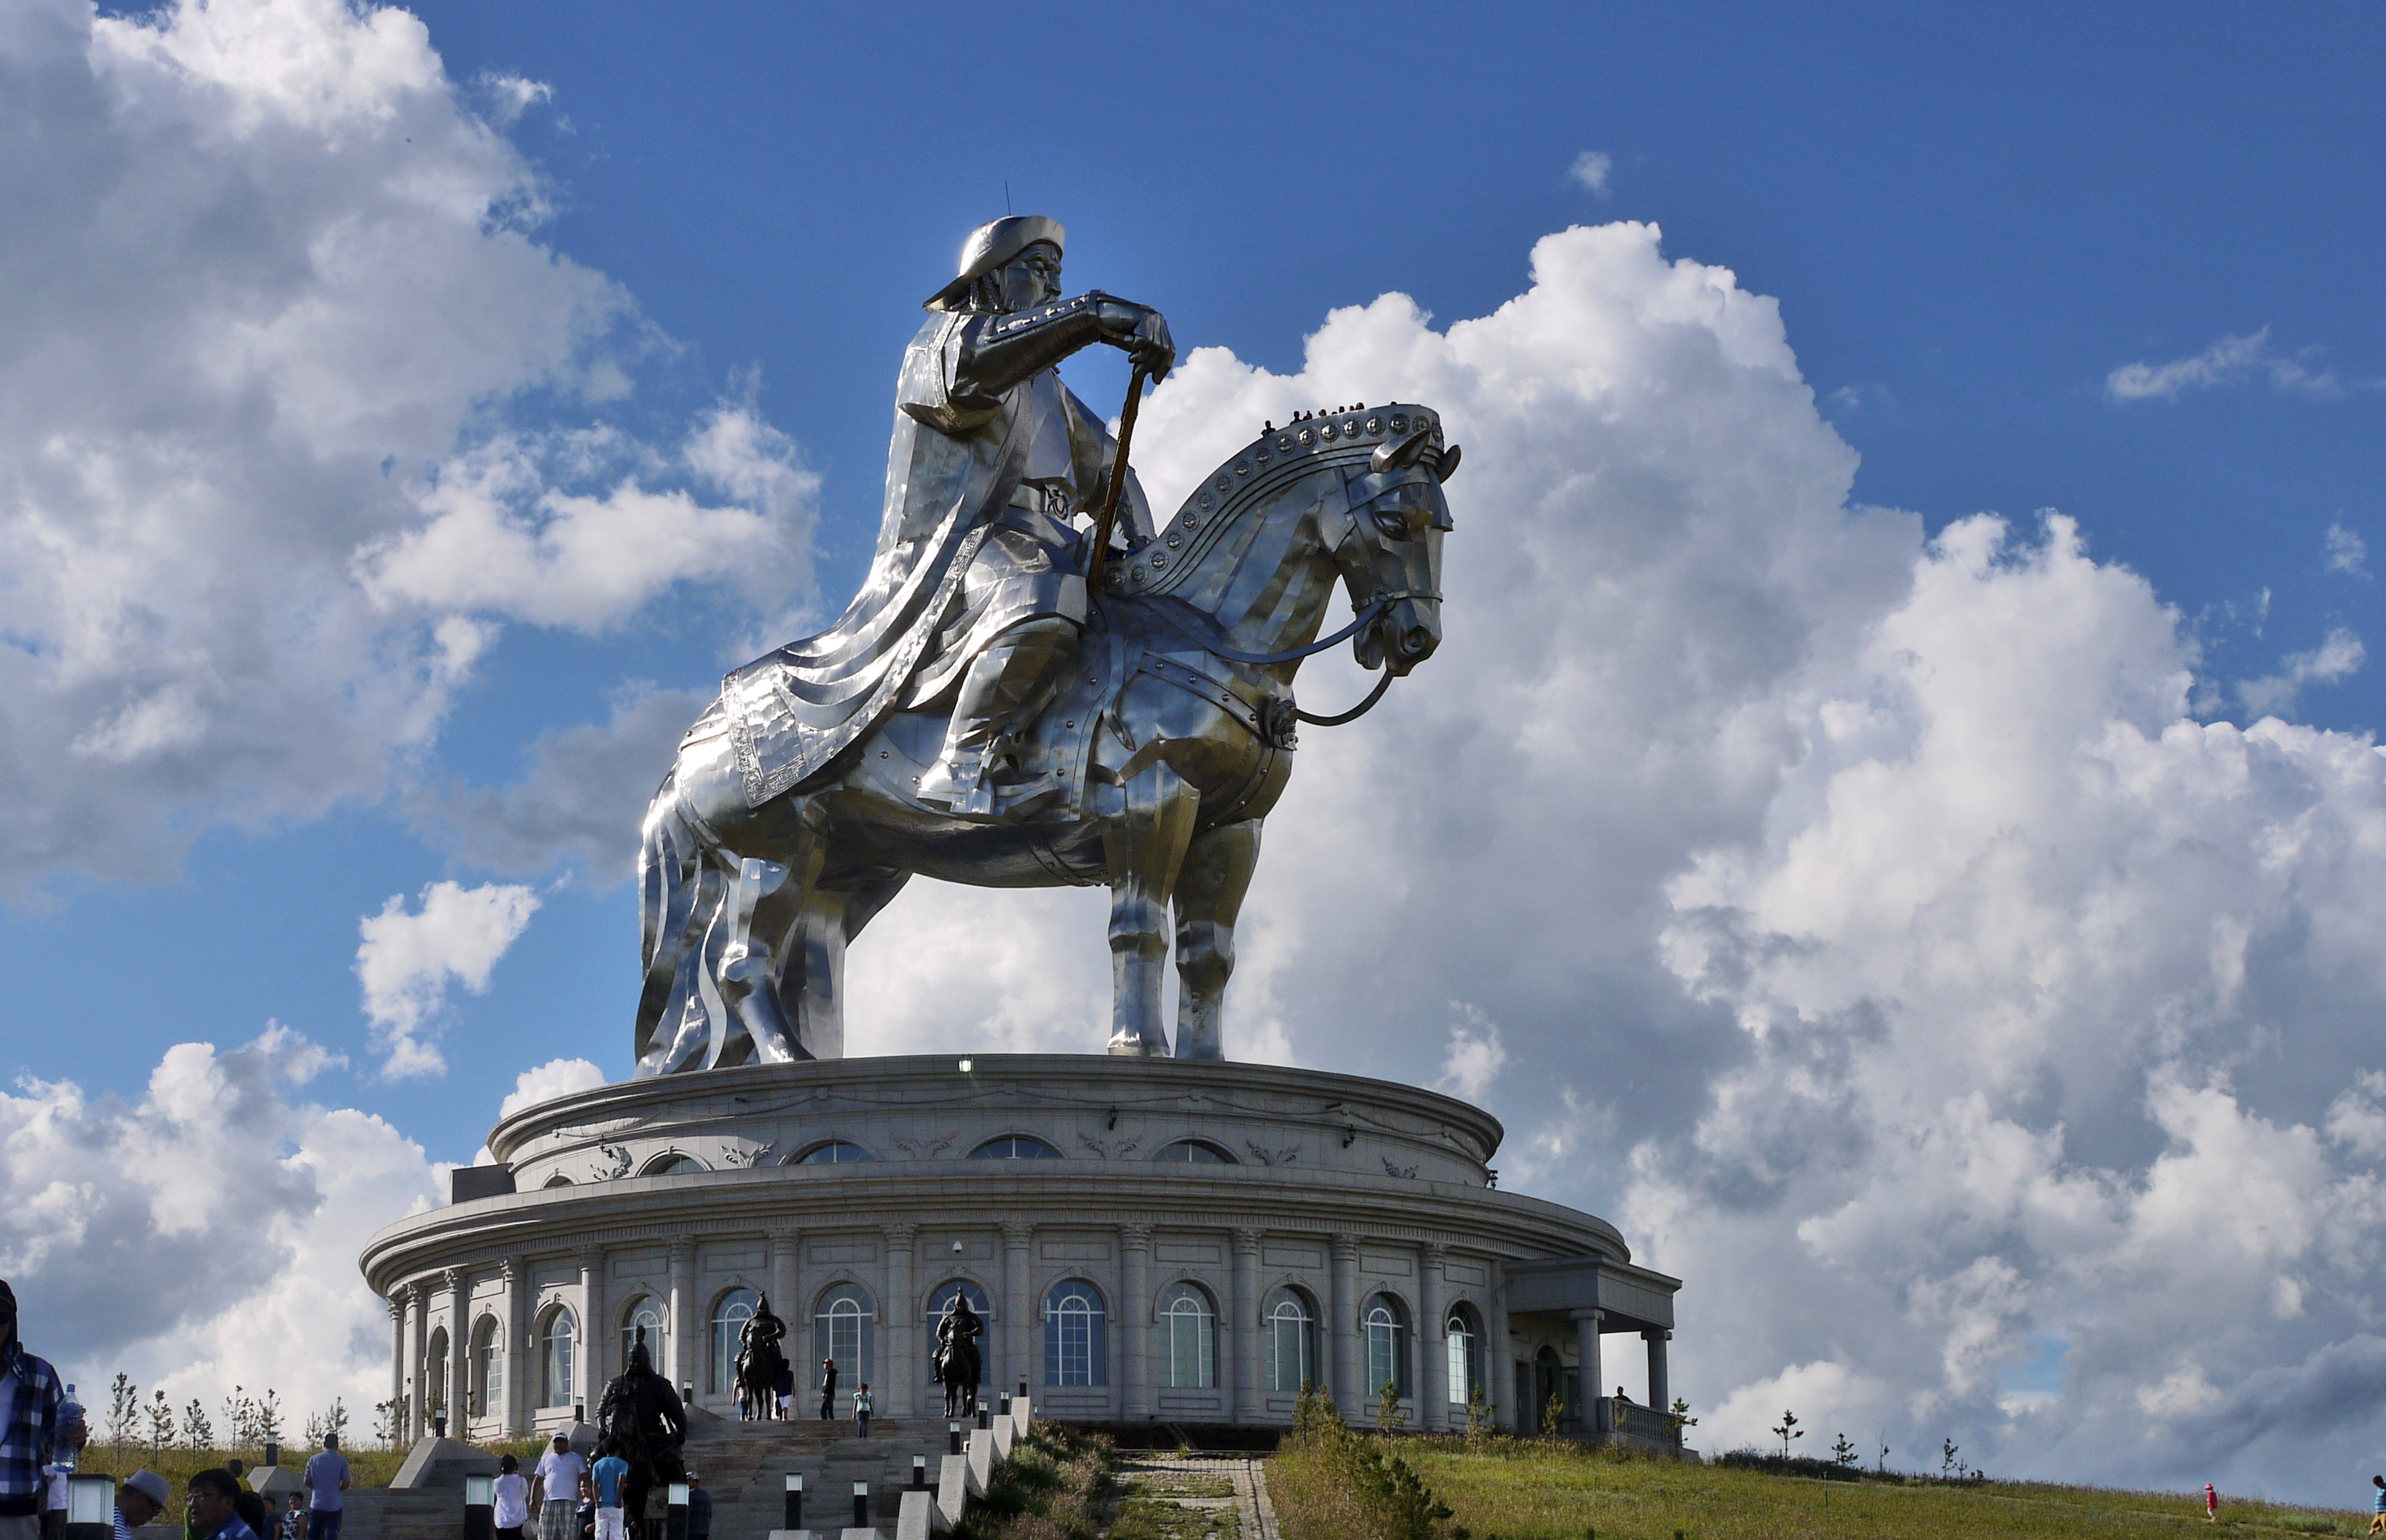 genghis-khan-equestrain-statue-1